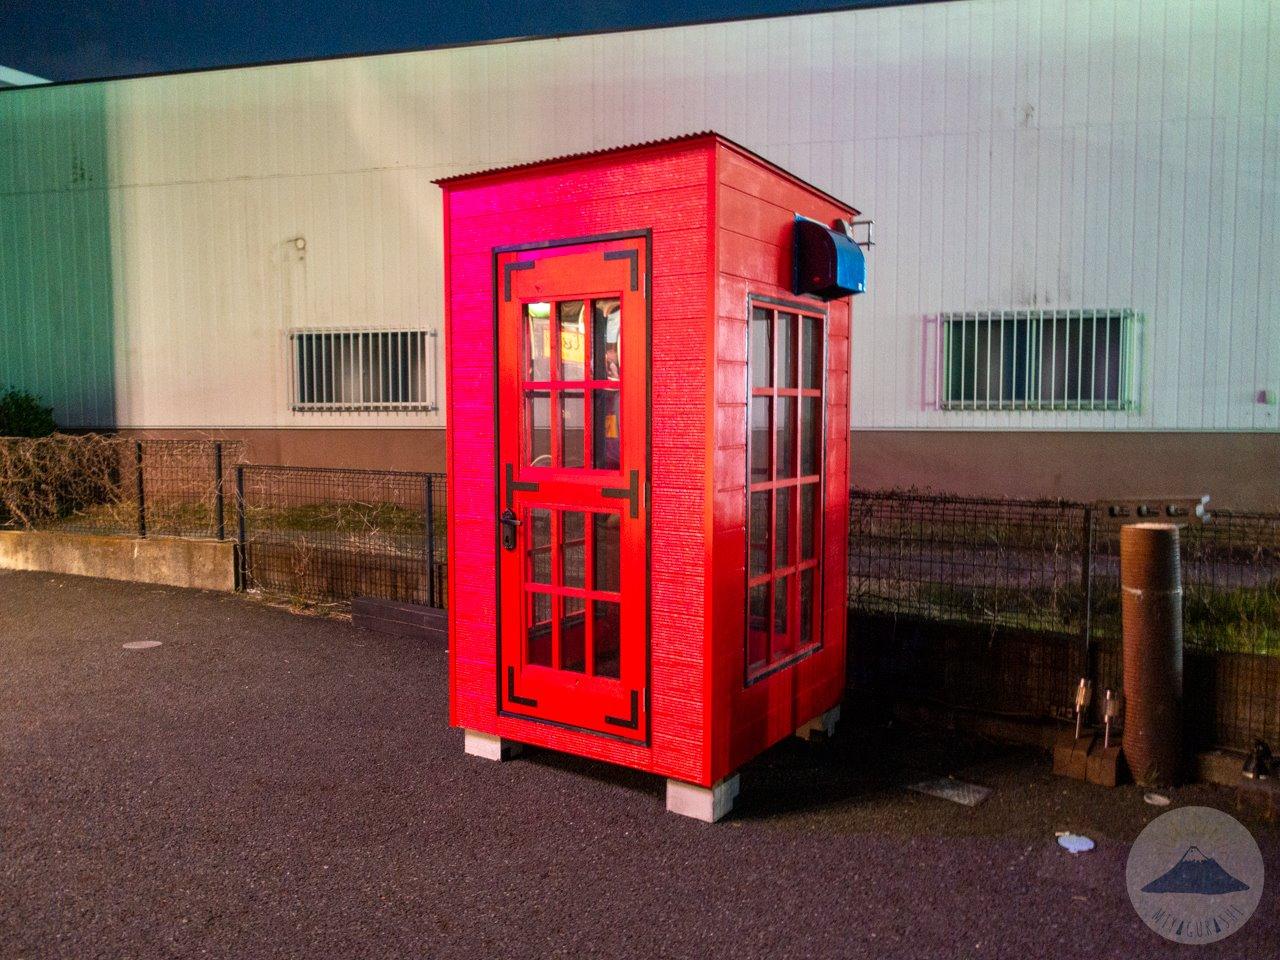 K-chupの外にある電話ボックス